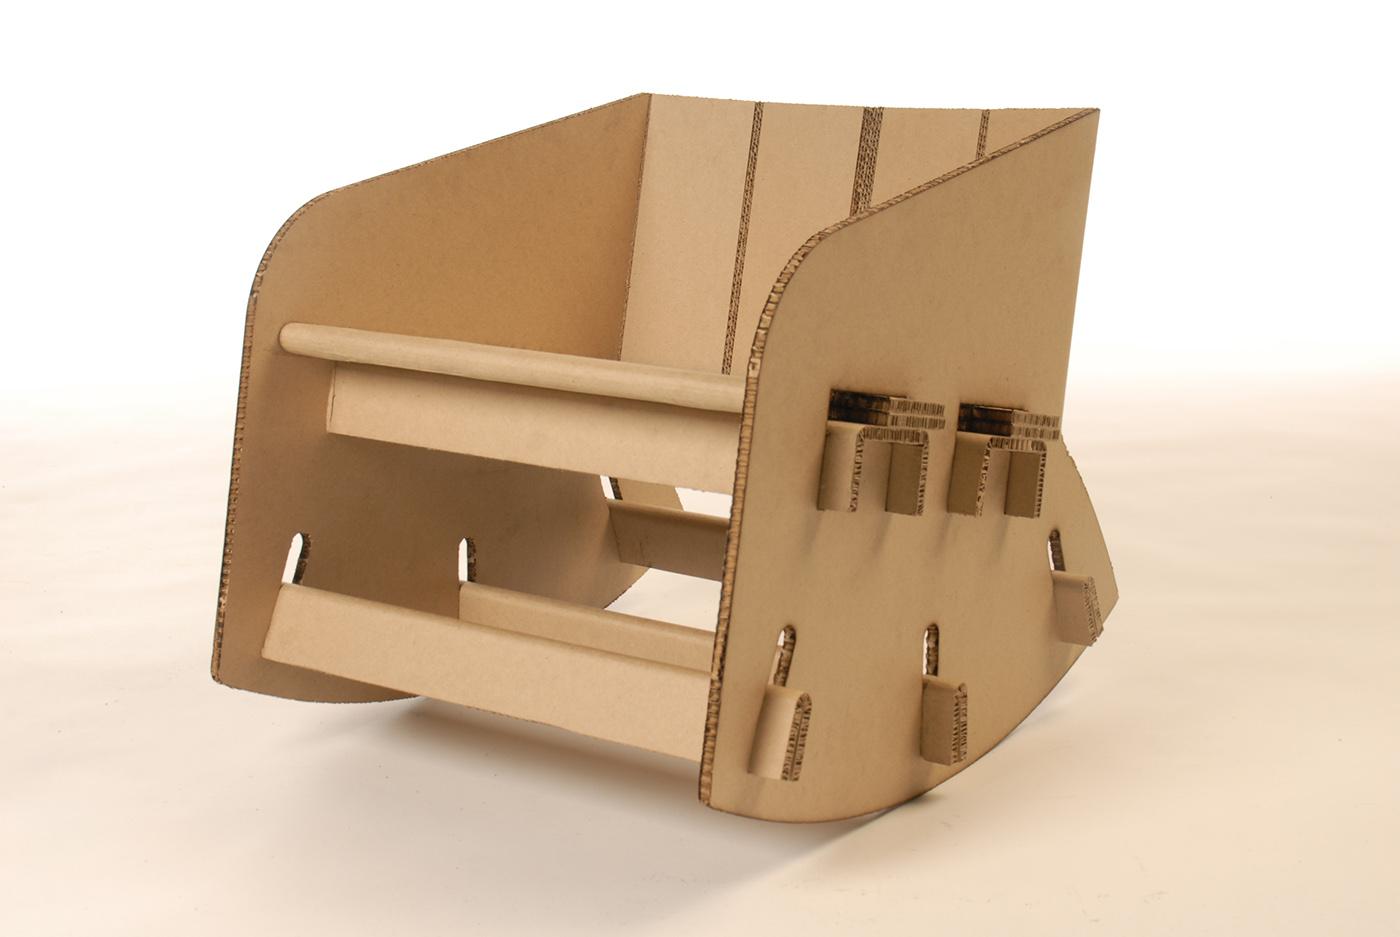 Cardboard rocking chair - Cardboard Rocking Chair 59